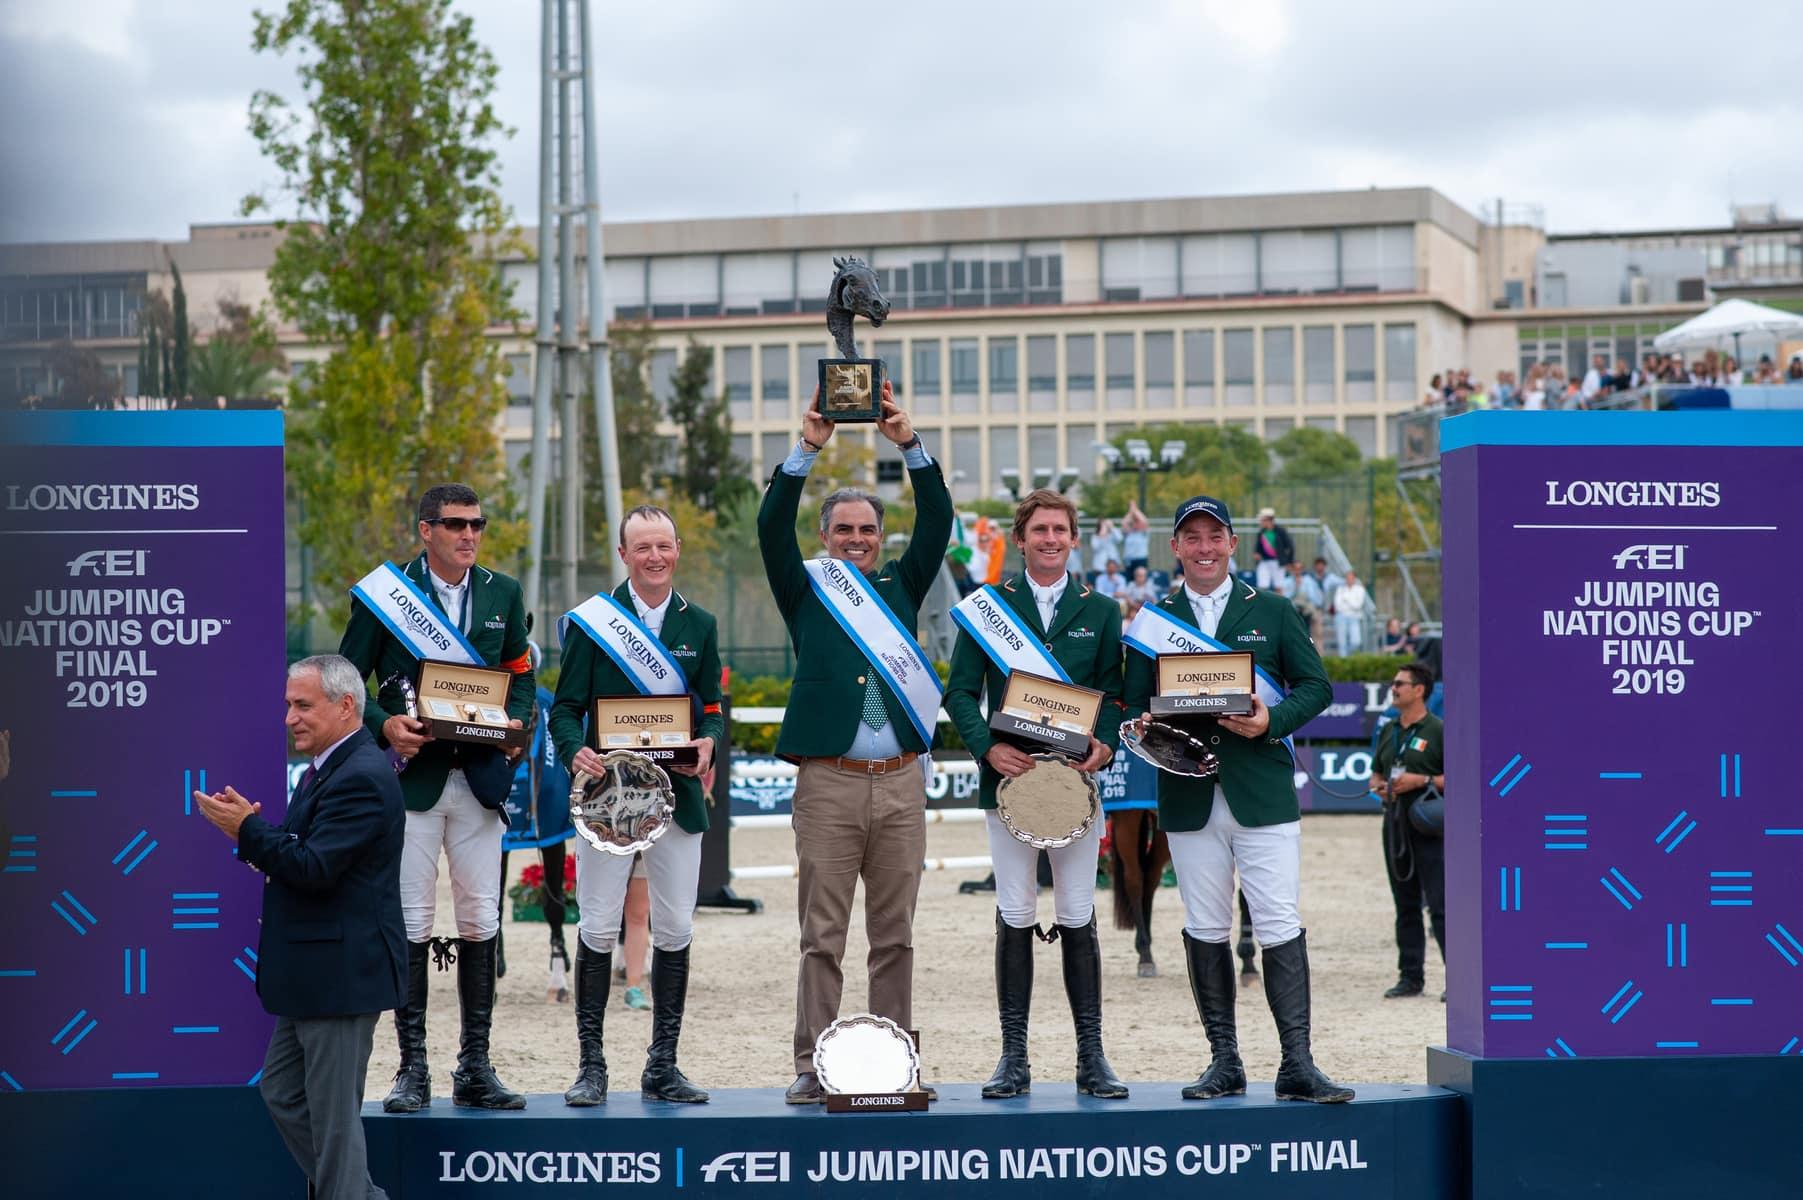 Sieg für Irland im LONGINES FEI Jumping Nations Cup – Final